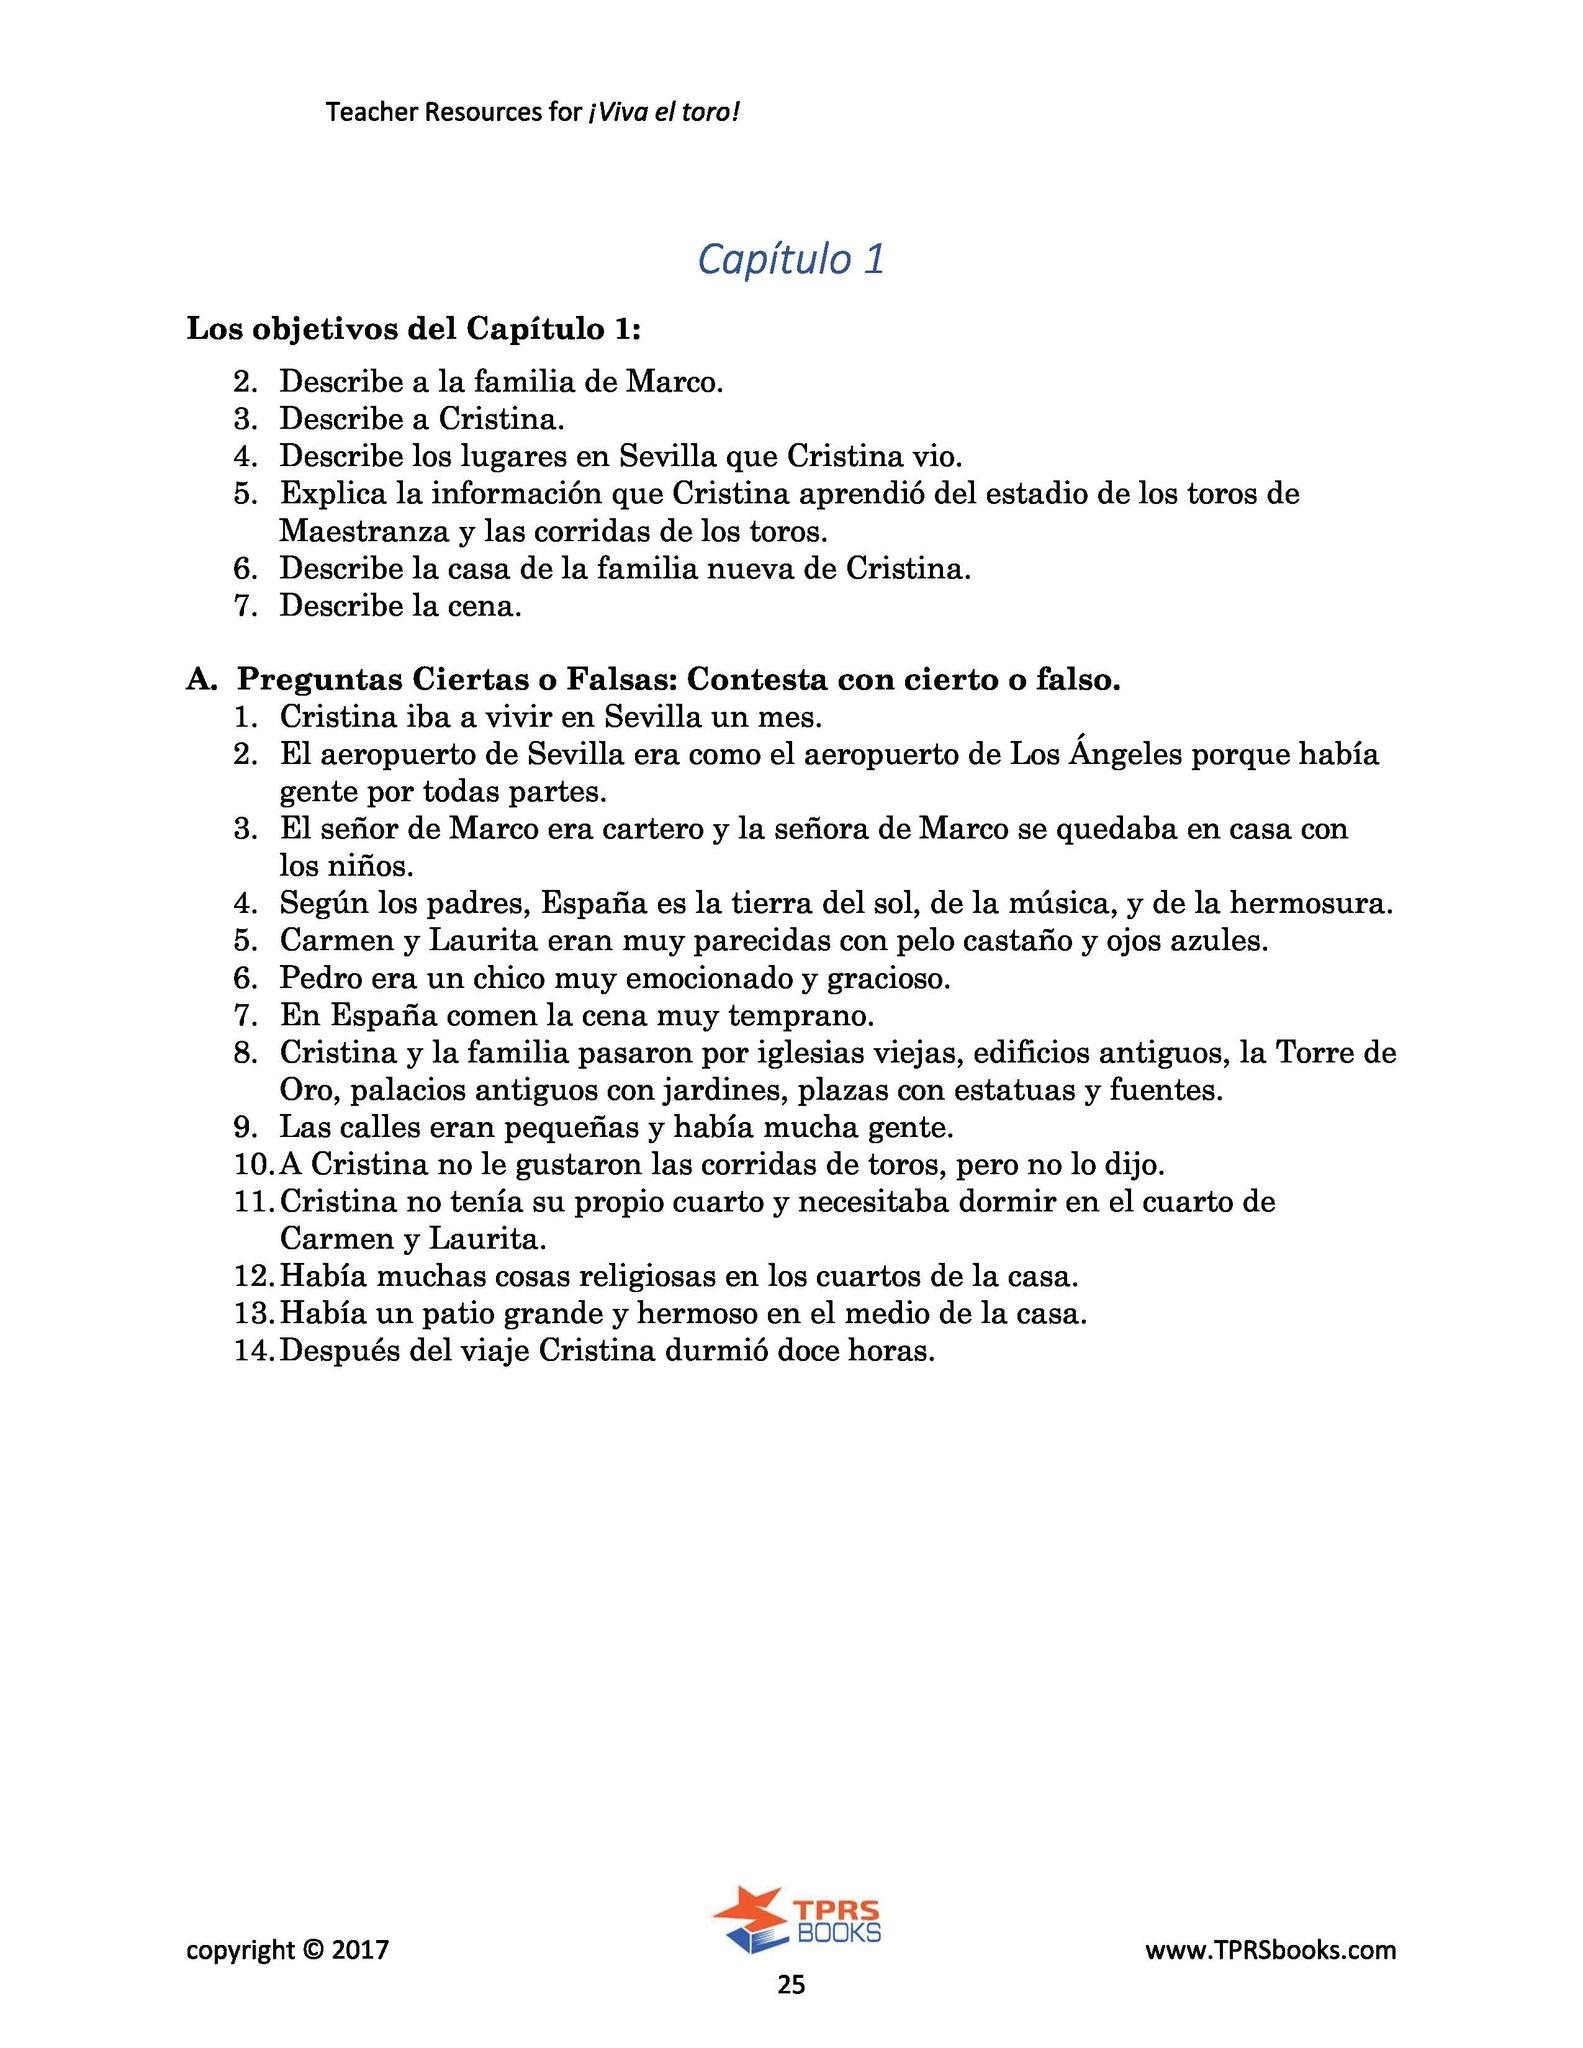 Viva el toro - Teacher's Guide